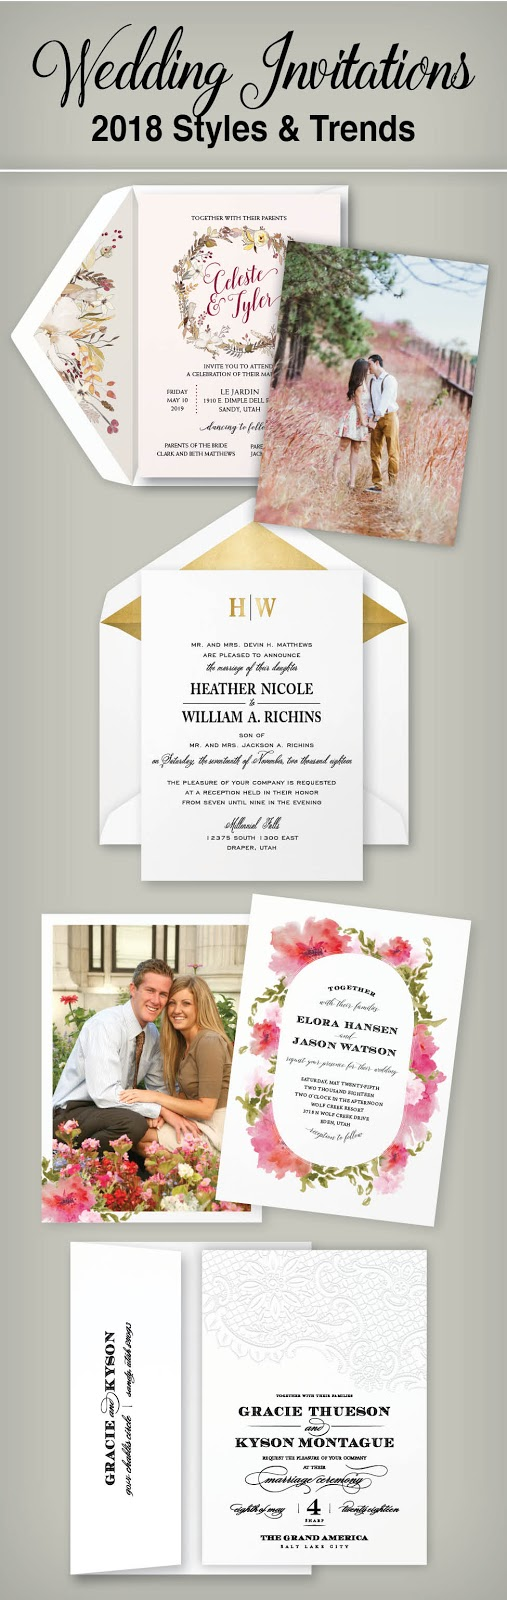 Wedding Invitation Blog 2018 Wedding Invitation Trends